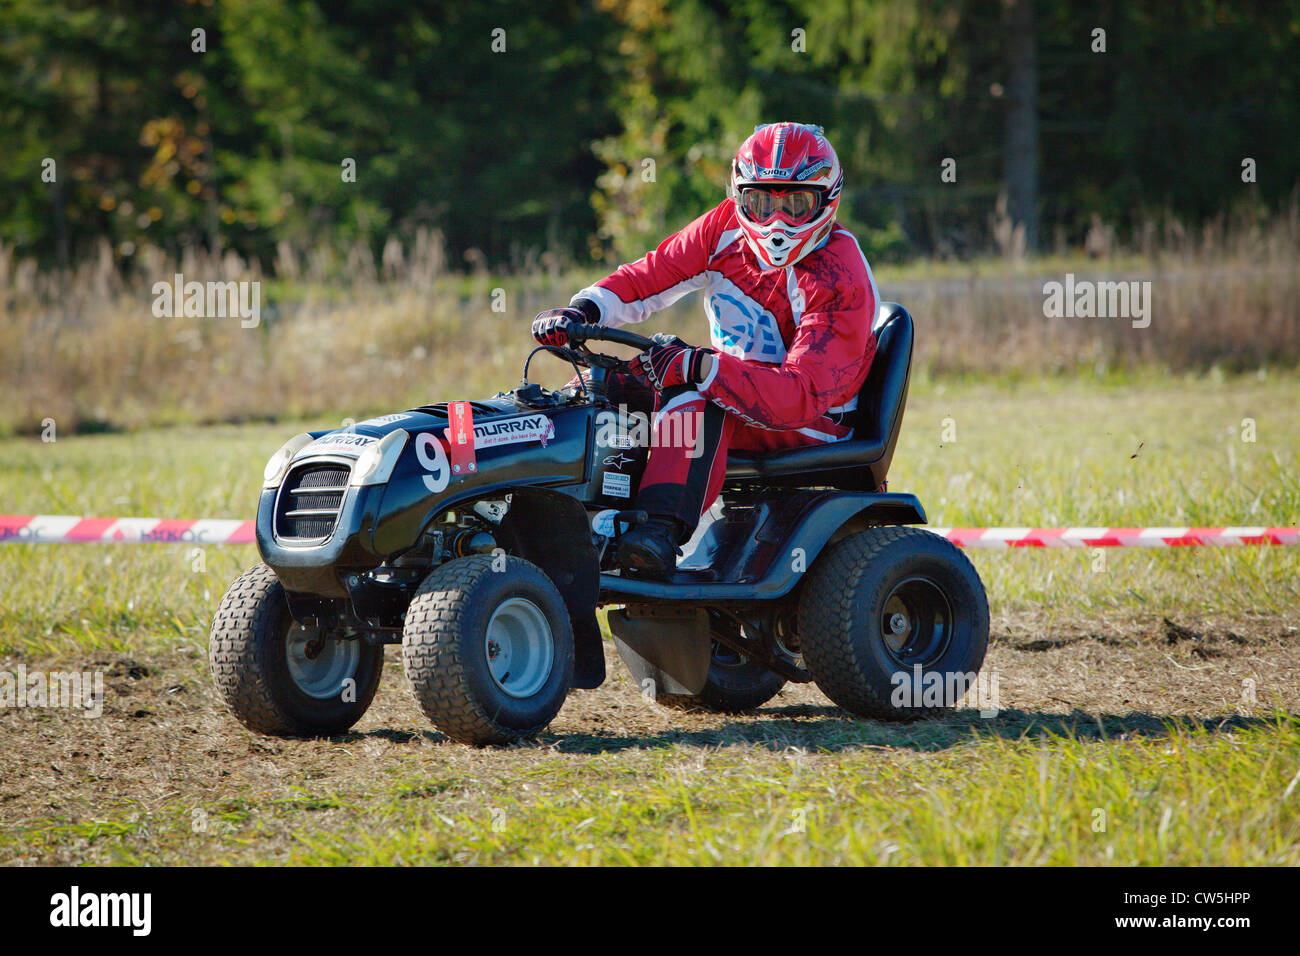 Lawn Mower Racing >> Lawn Mower Race Stock Photos Lawn Mower Race Stock Images